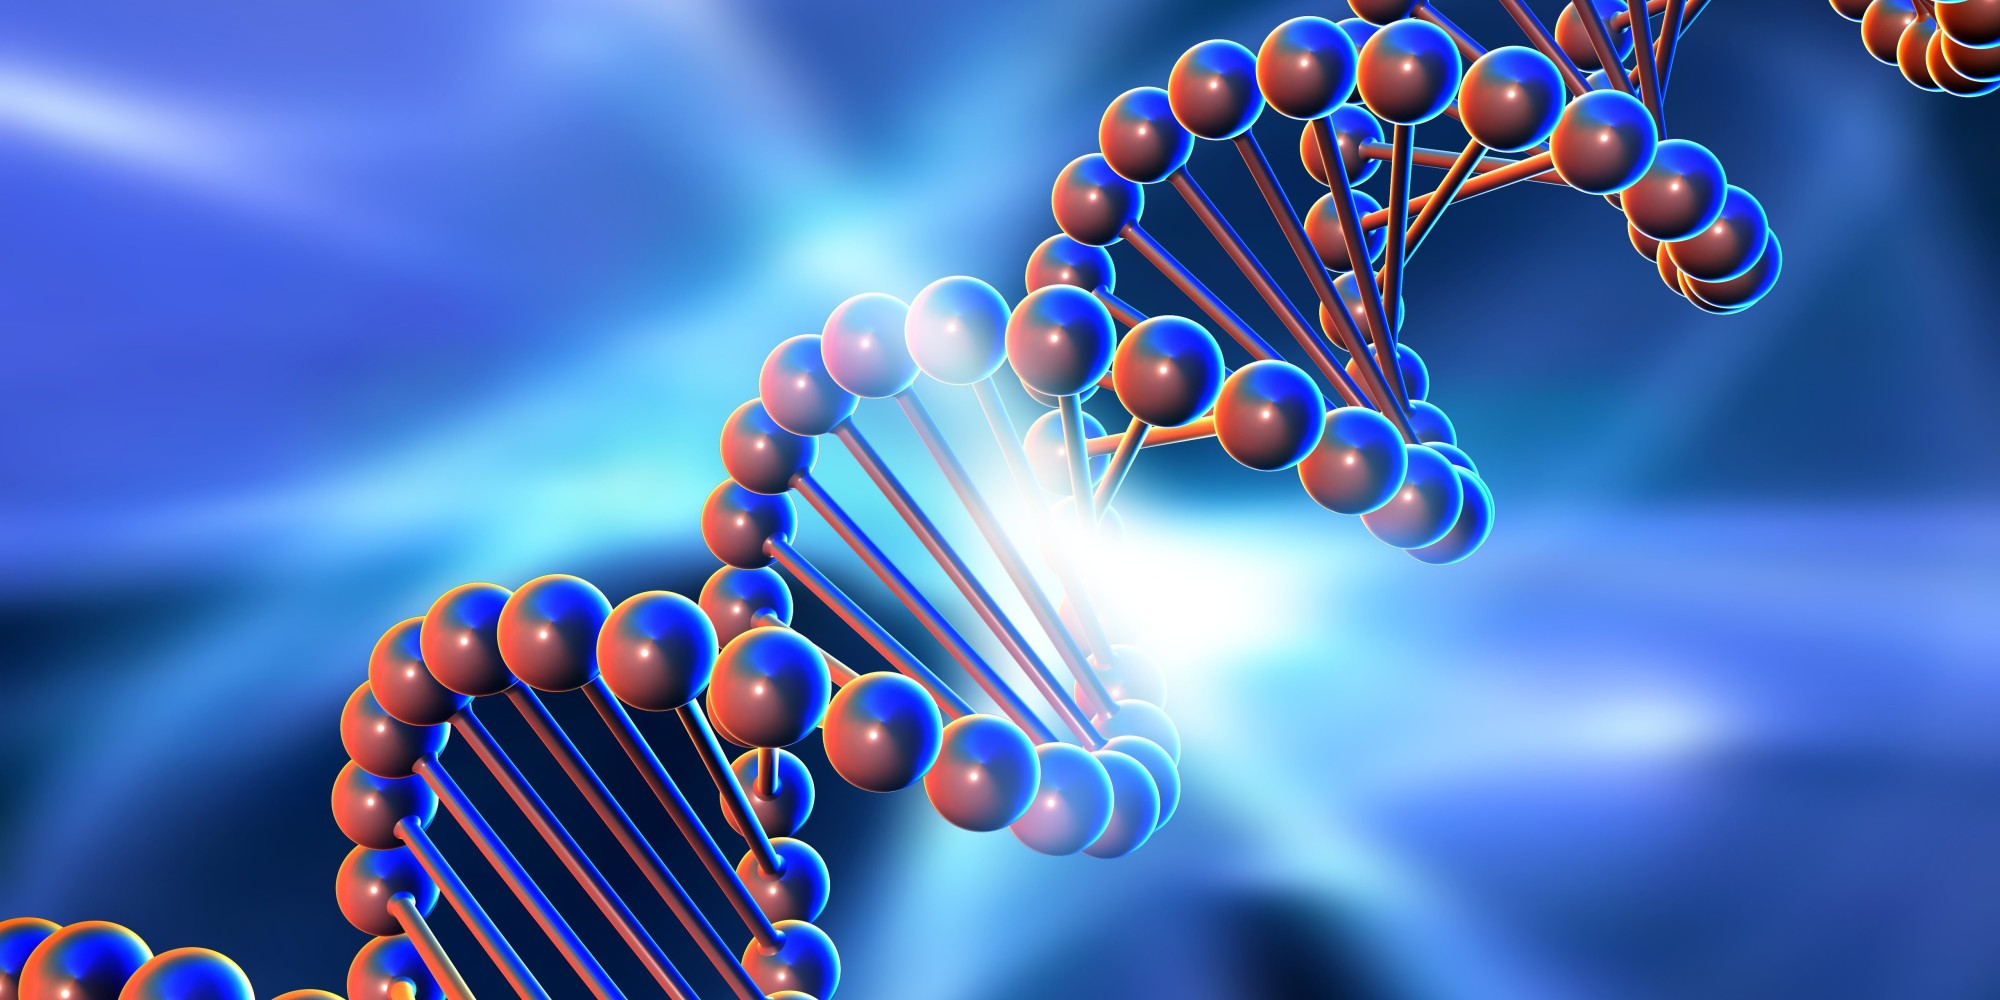 Controversial Human Genome Editing Technology Faces Fresh ... Репликация ДНК Анимация